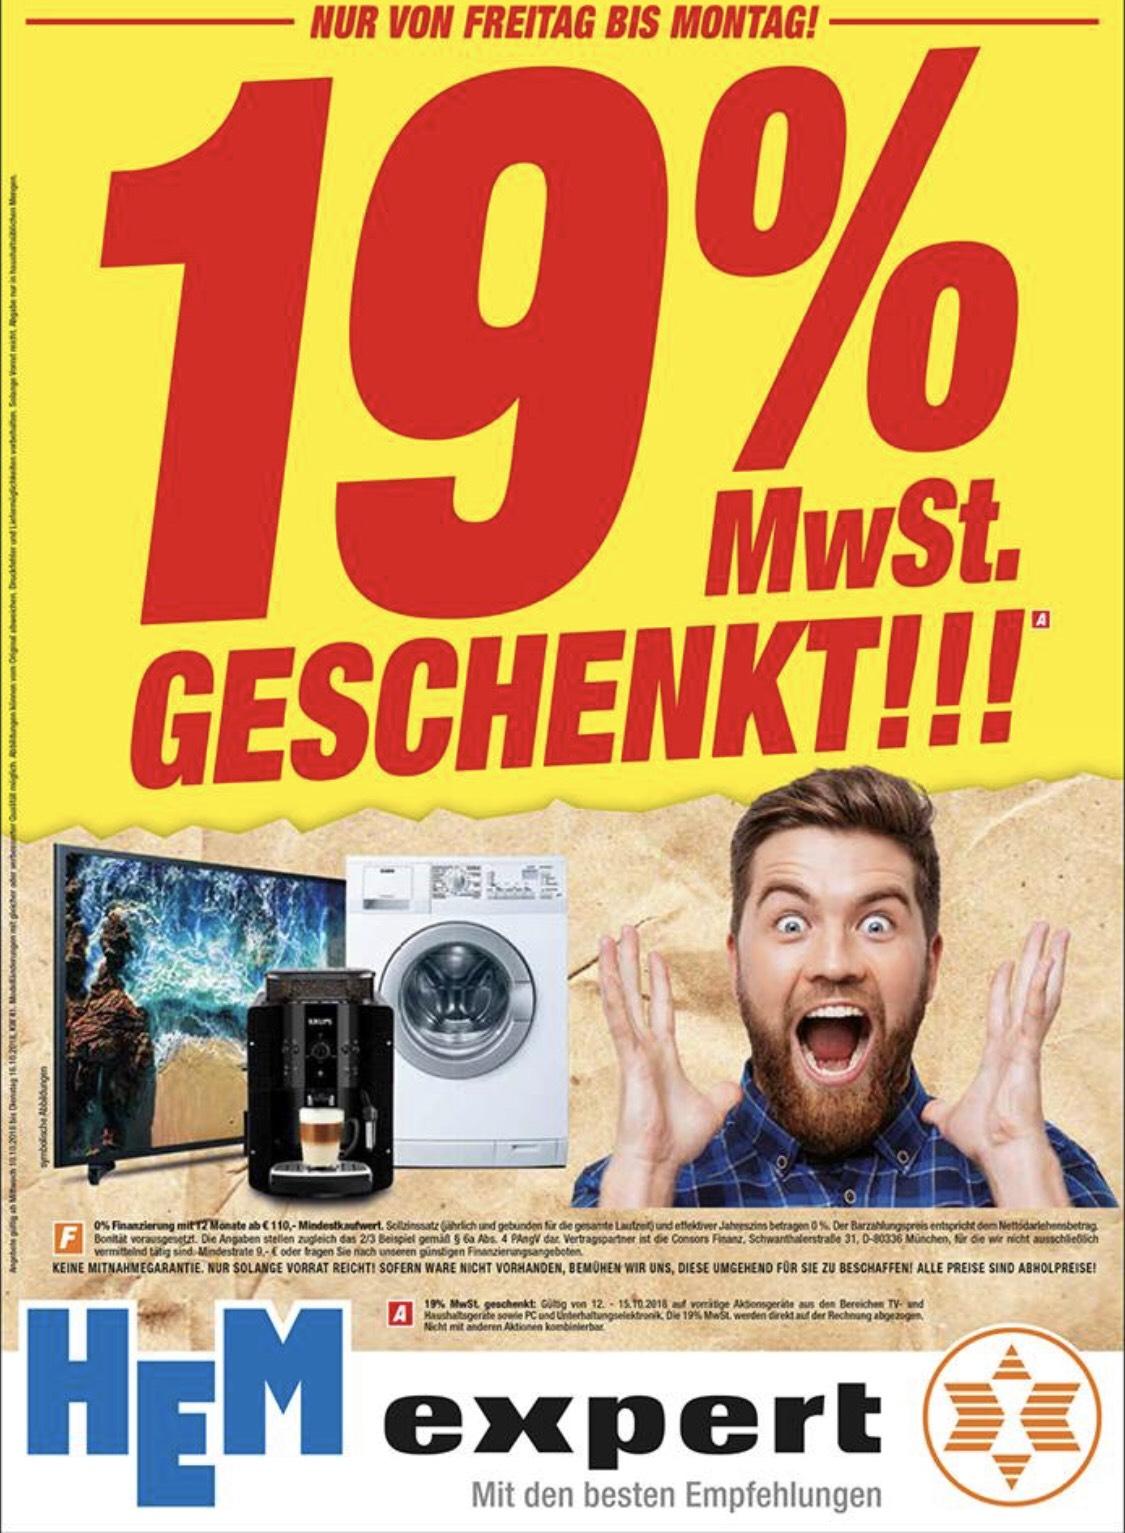 Expert schenkt euch 19% MwSt.! [teilw. Lokal]